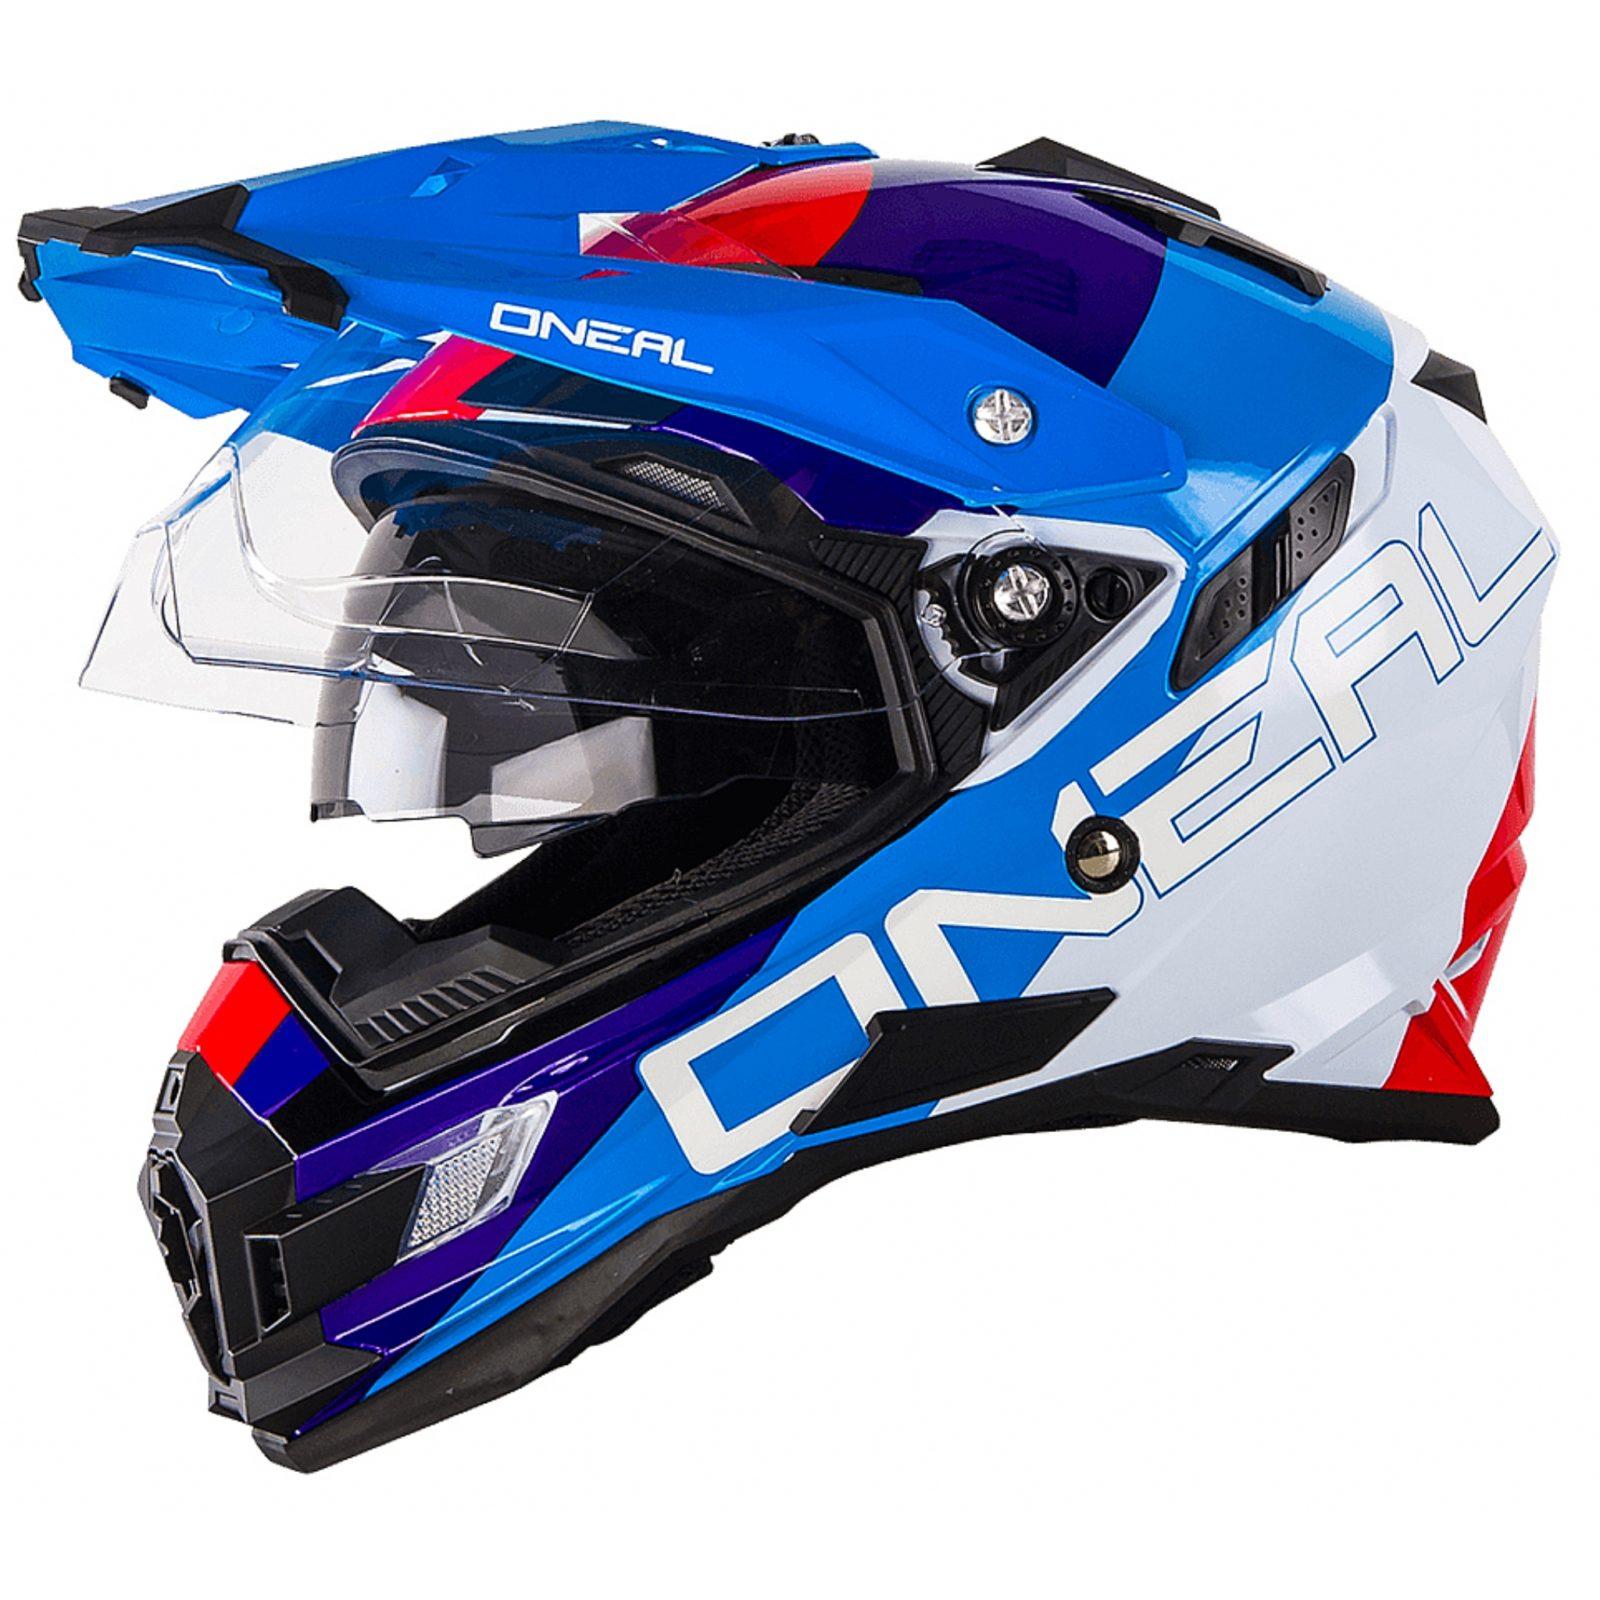 Шлем Sierra Adventure Helmet EDGE красный/синий/белый фото 2